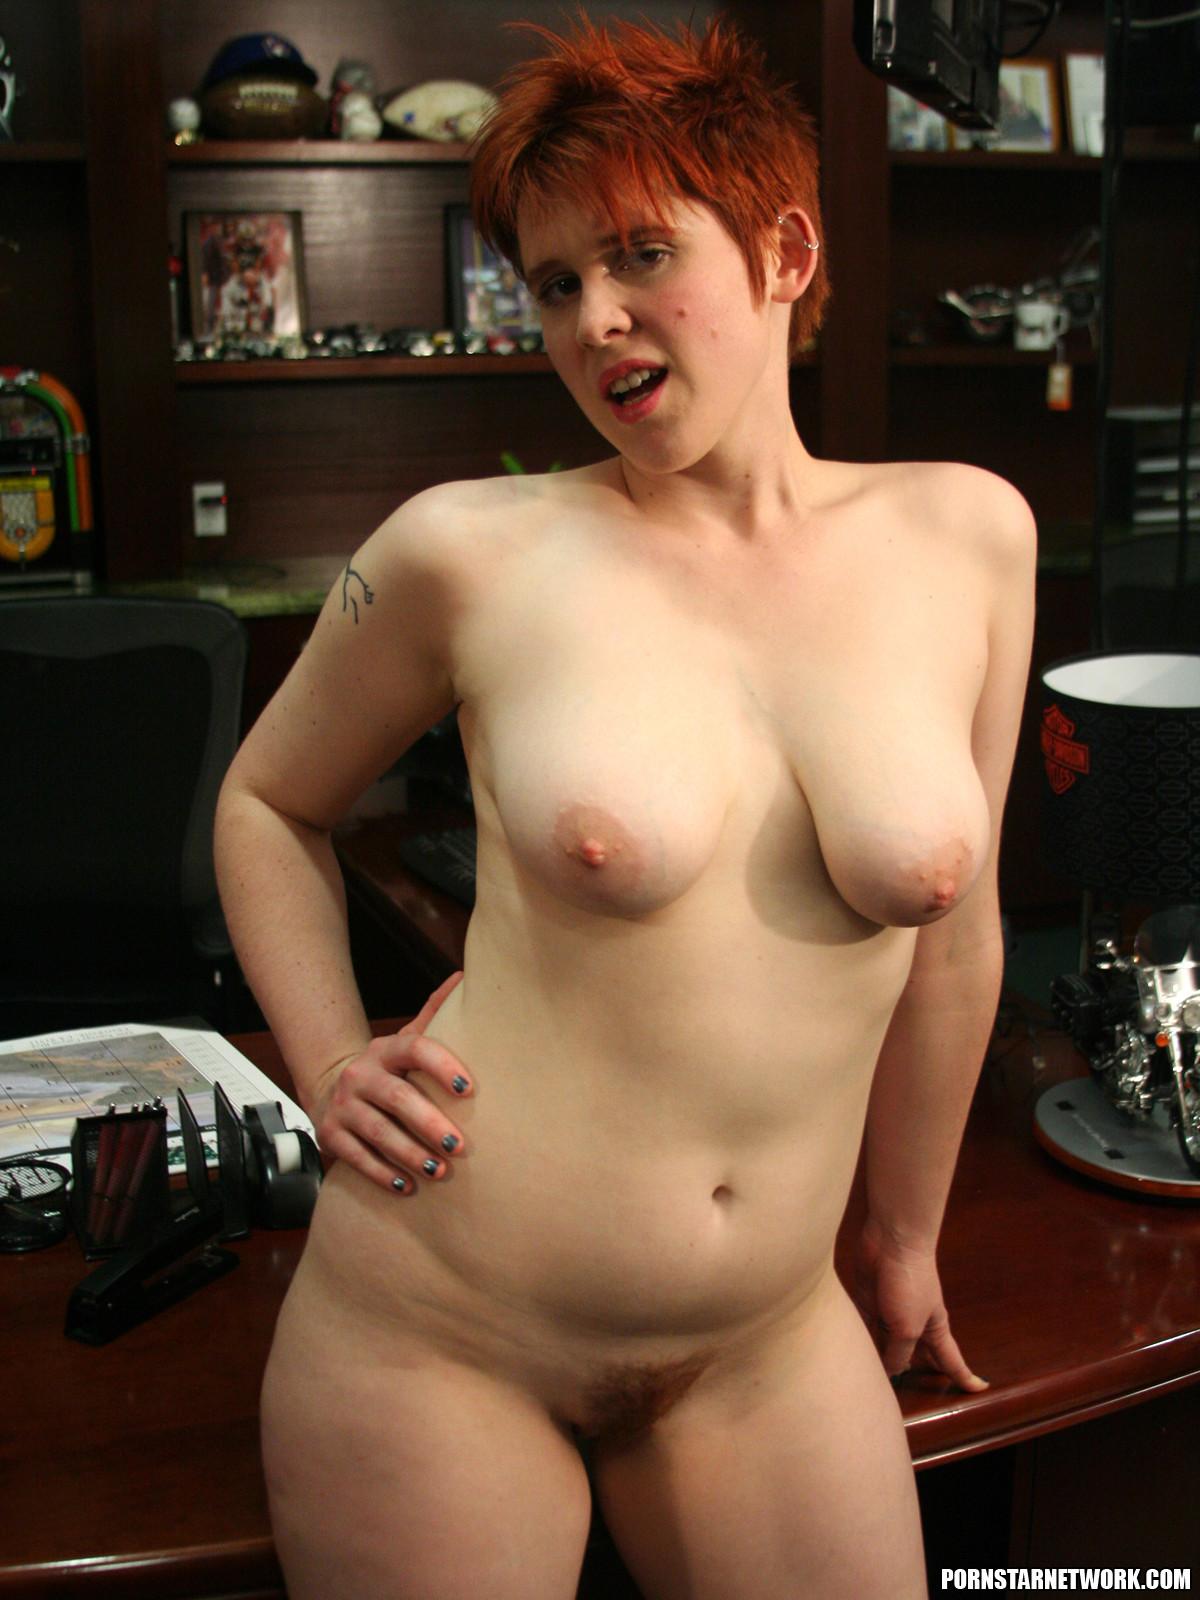 image Kagney linn karter two cock anal fuck slut